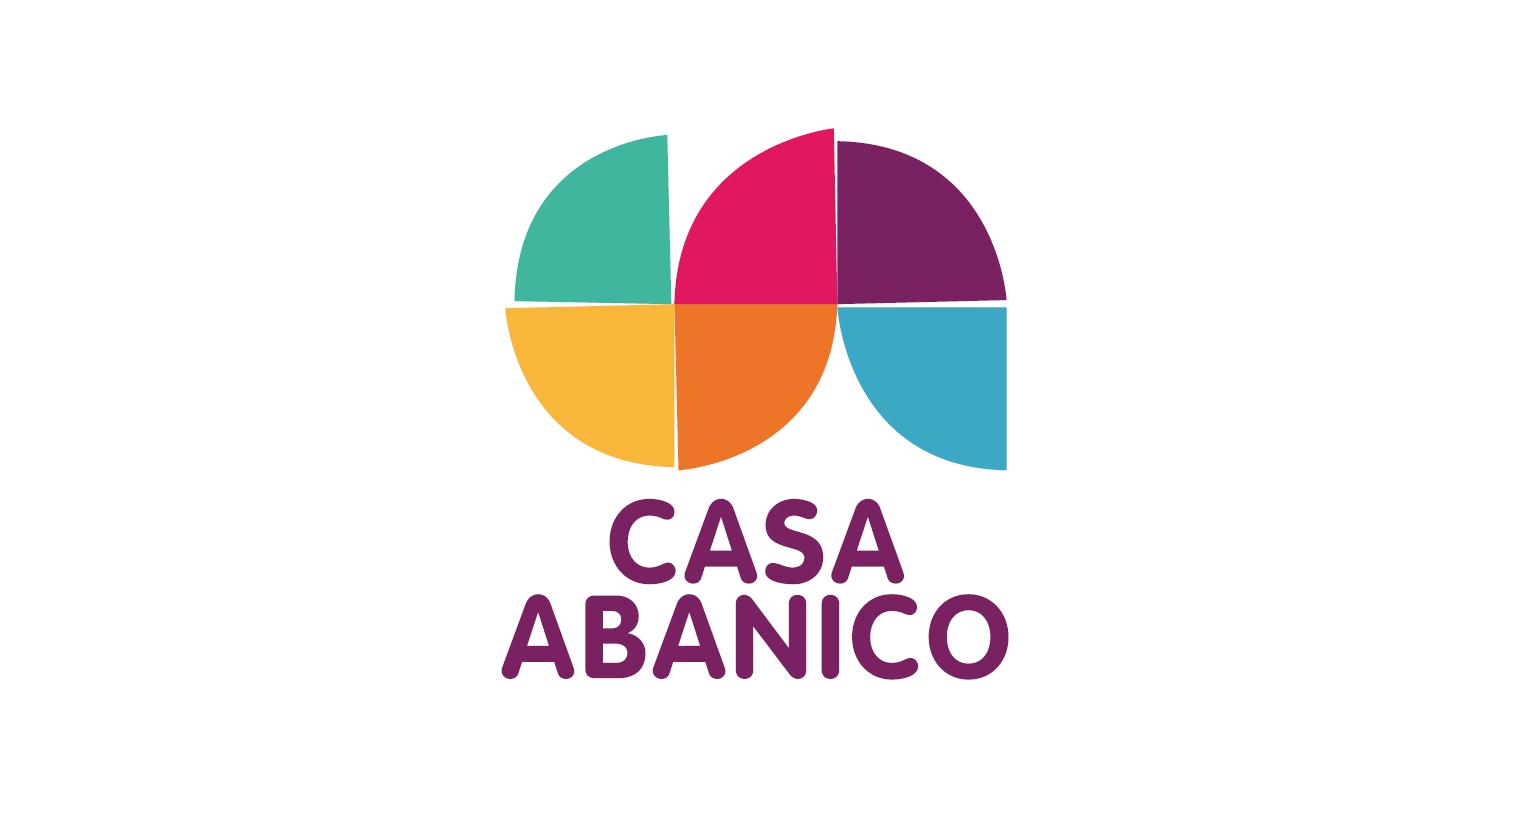 Logocasaabanico